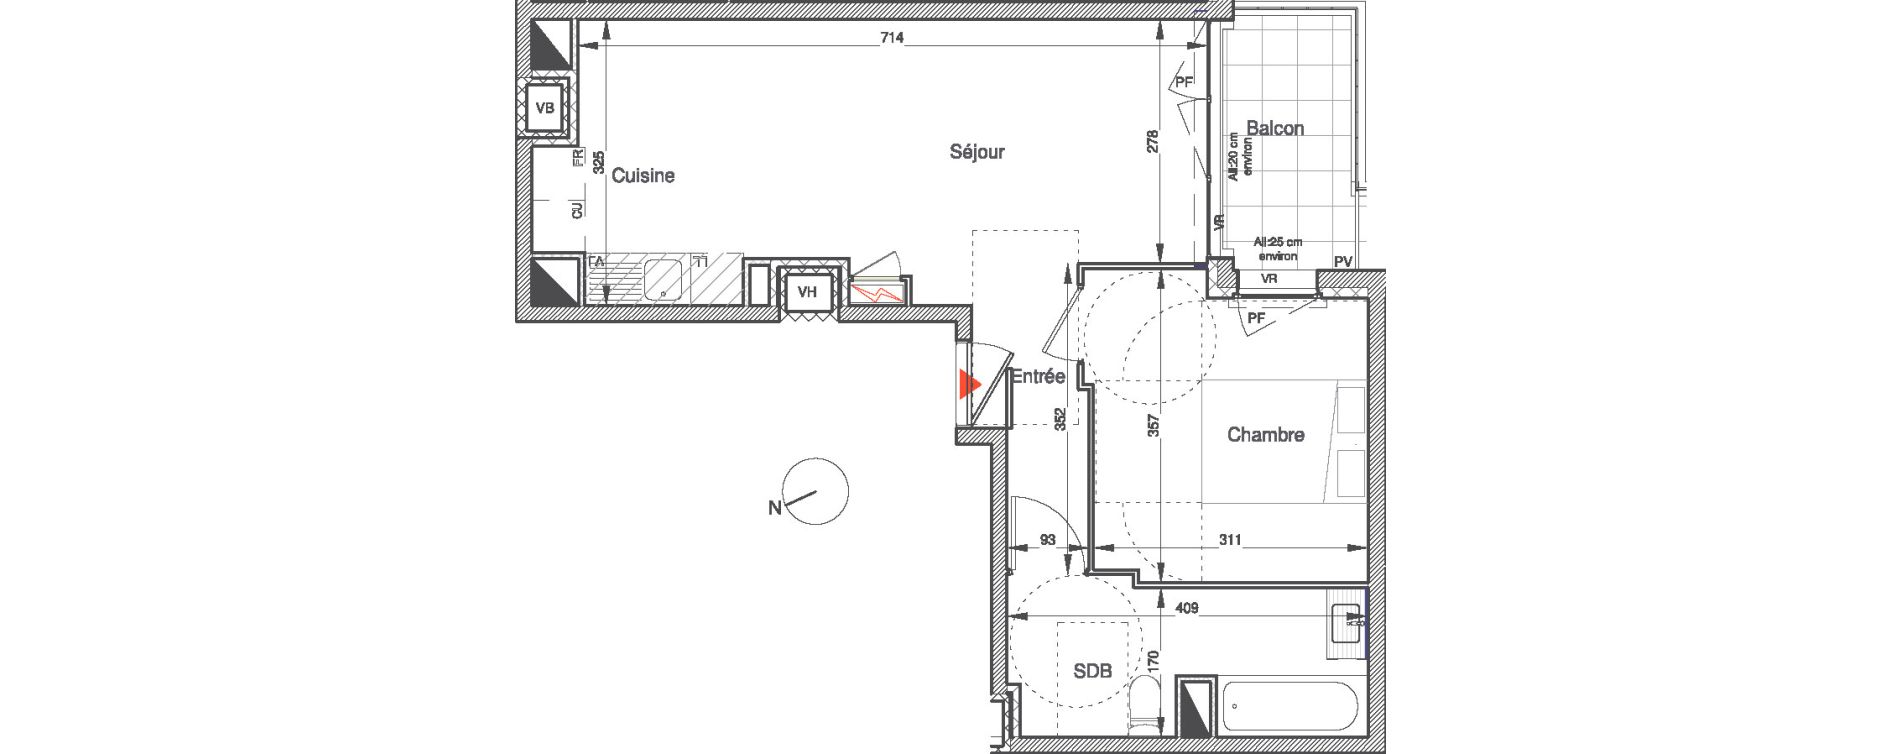 Appartement T2 de 42,79 m2 à Villepinte Vert galant